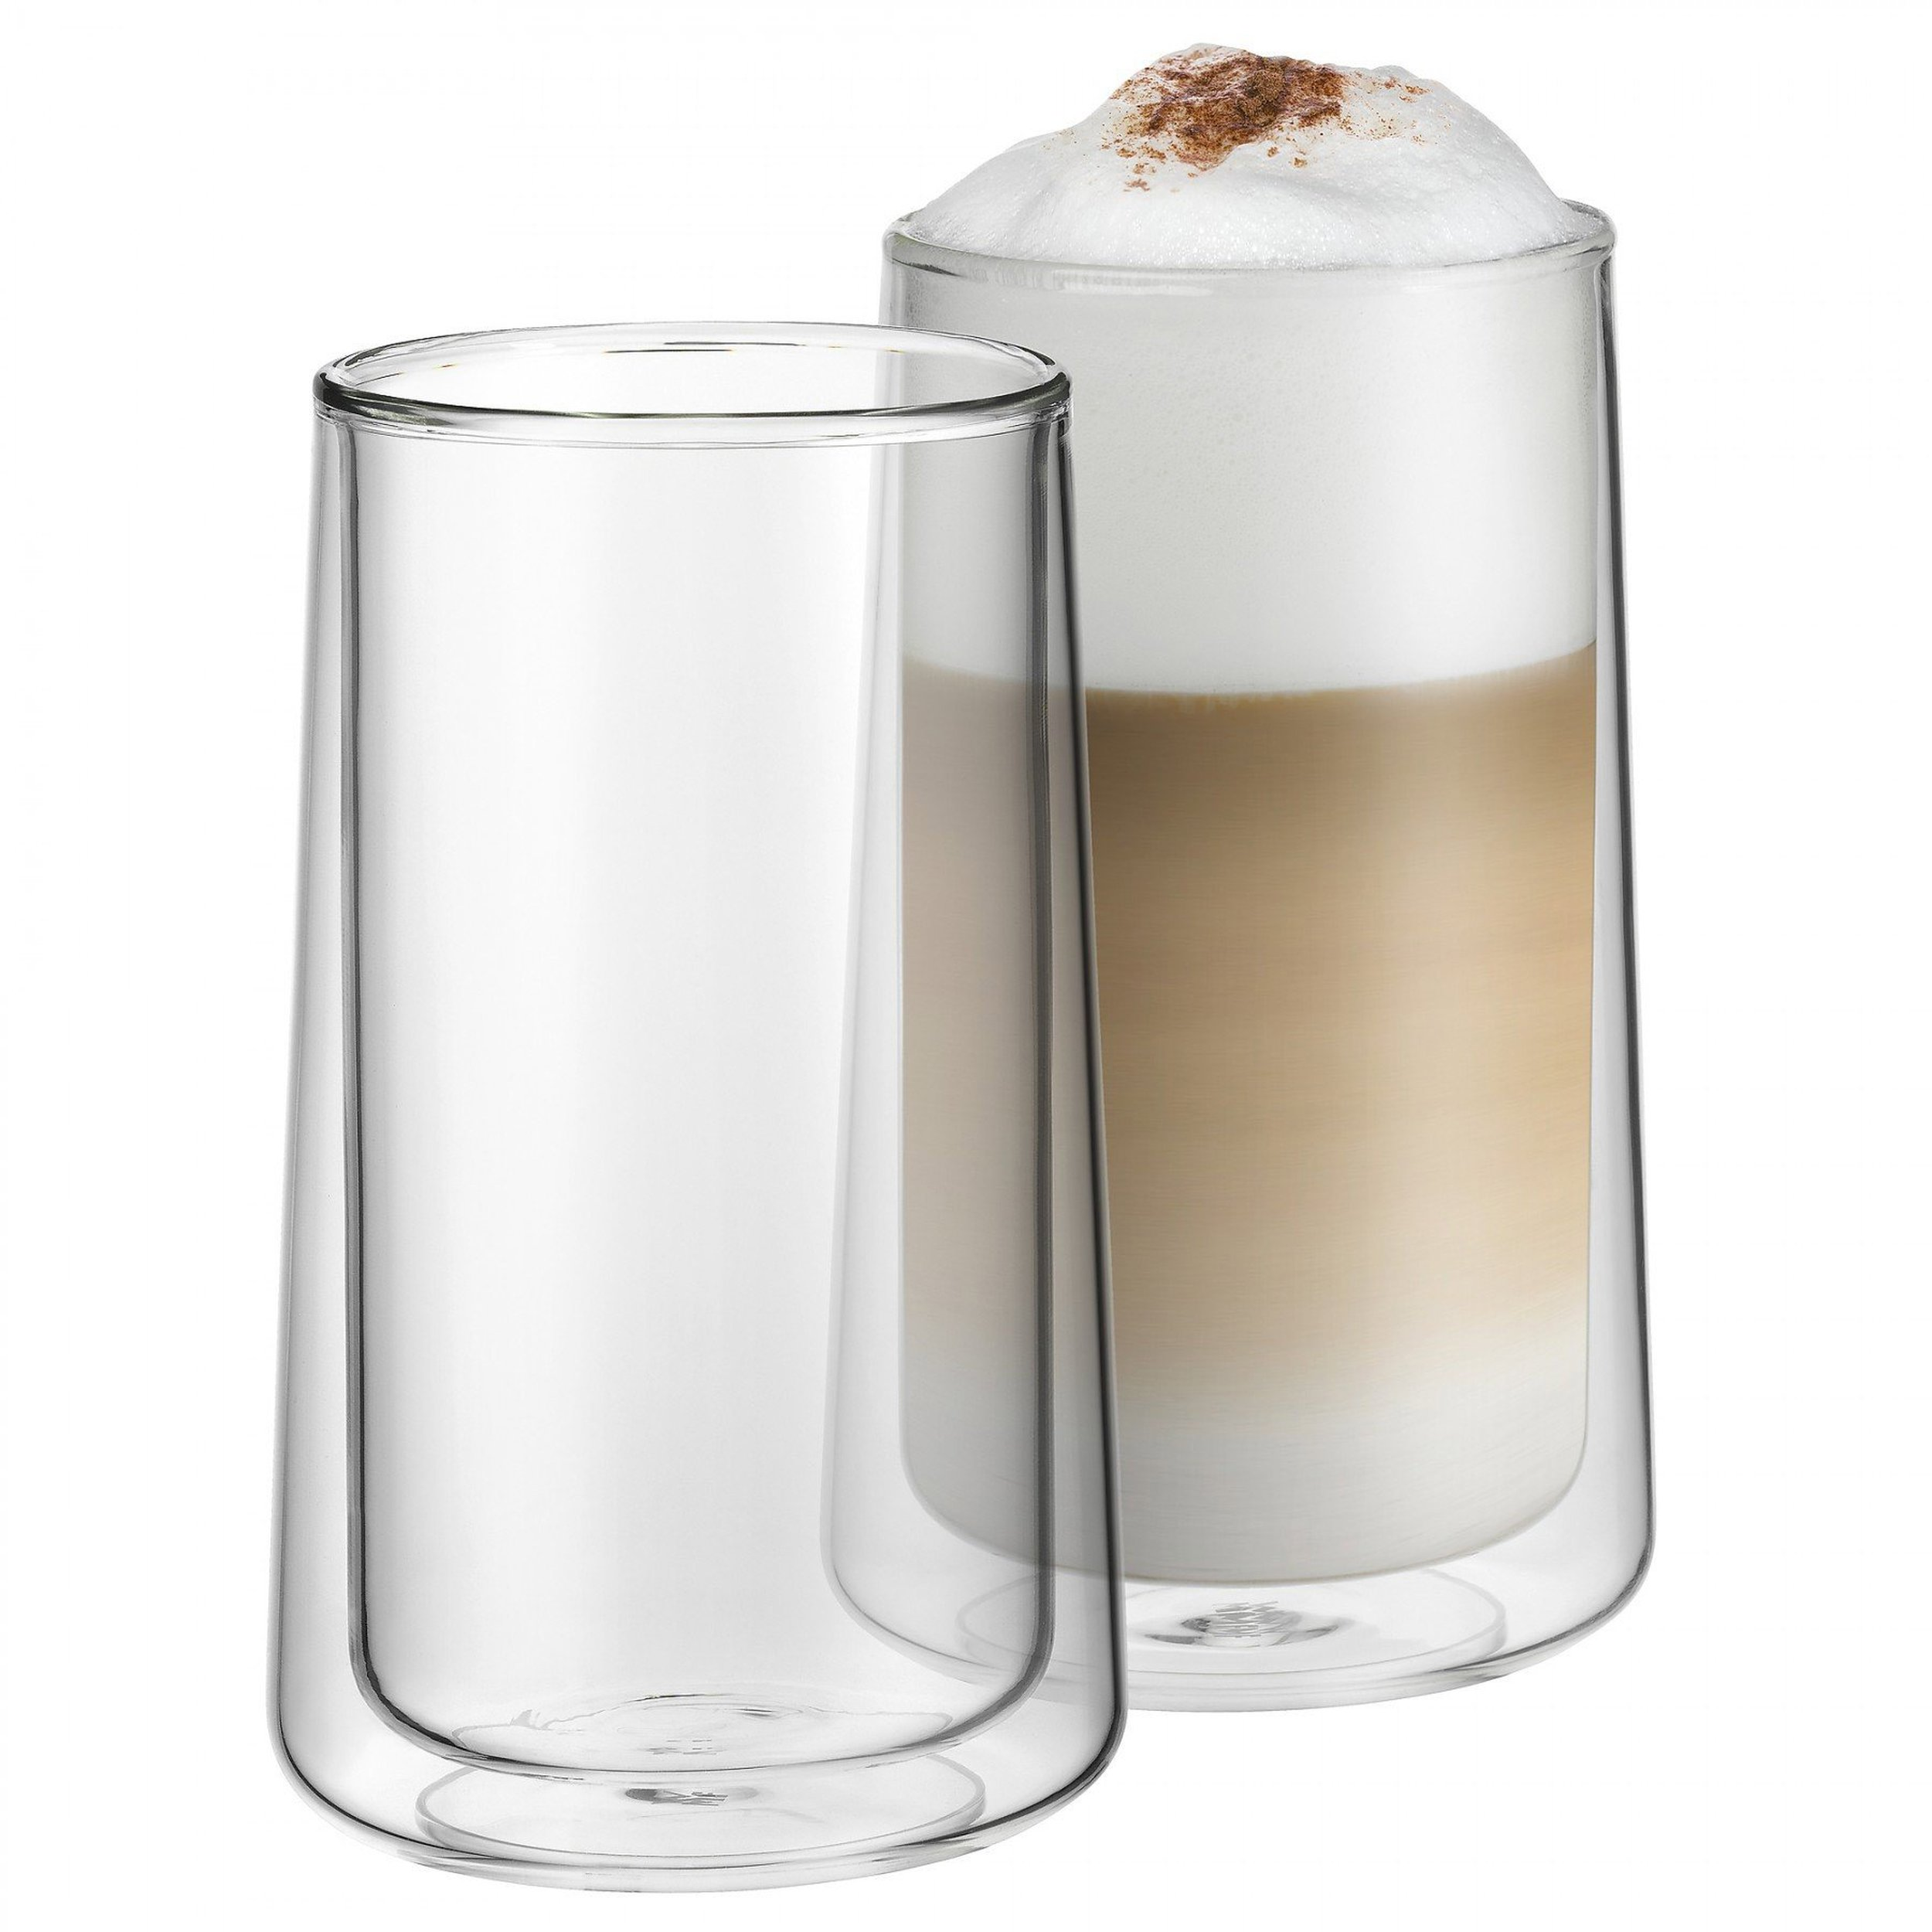 szklanka o podw jnych ciankach do latte macchiato coffee. Black Bedroom Furniture Sets. Home Design Ideas